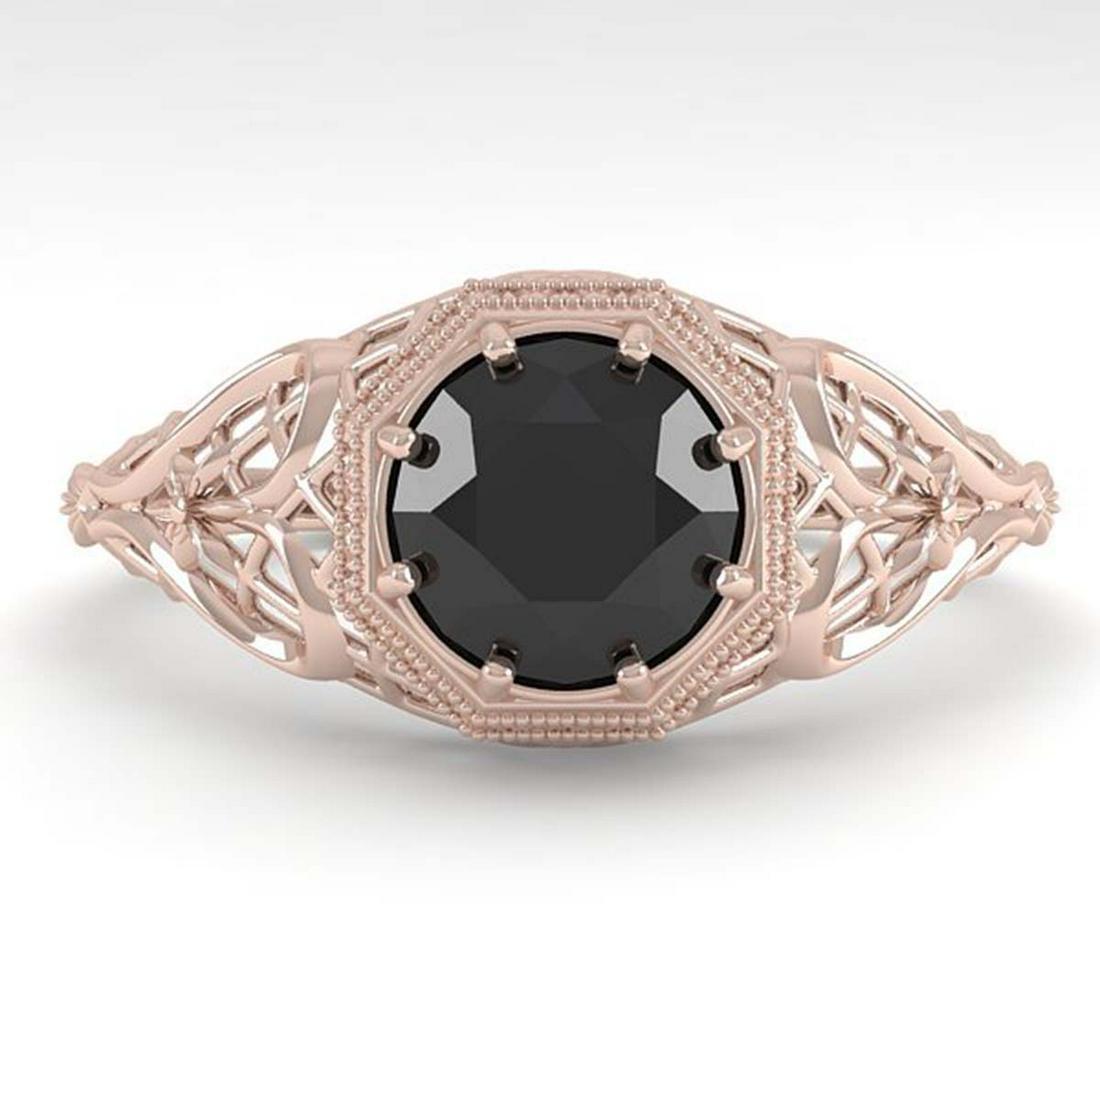 1.0 ctw Black Diamond Ring Art Deco 14K Rose Gold